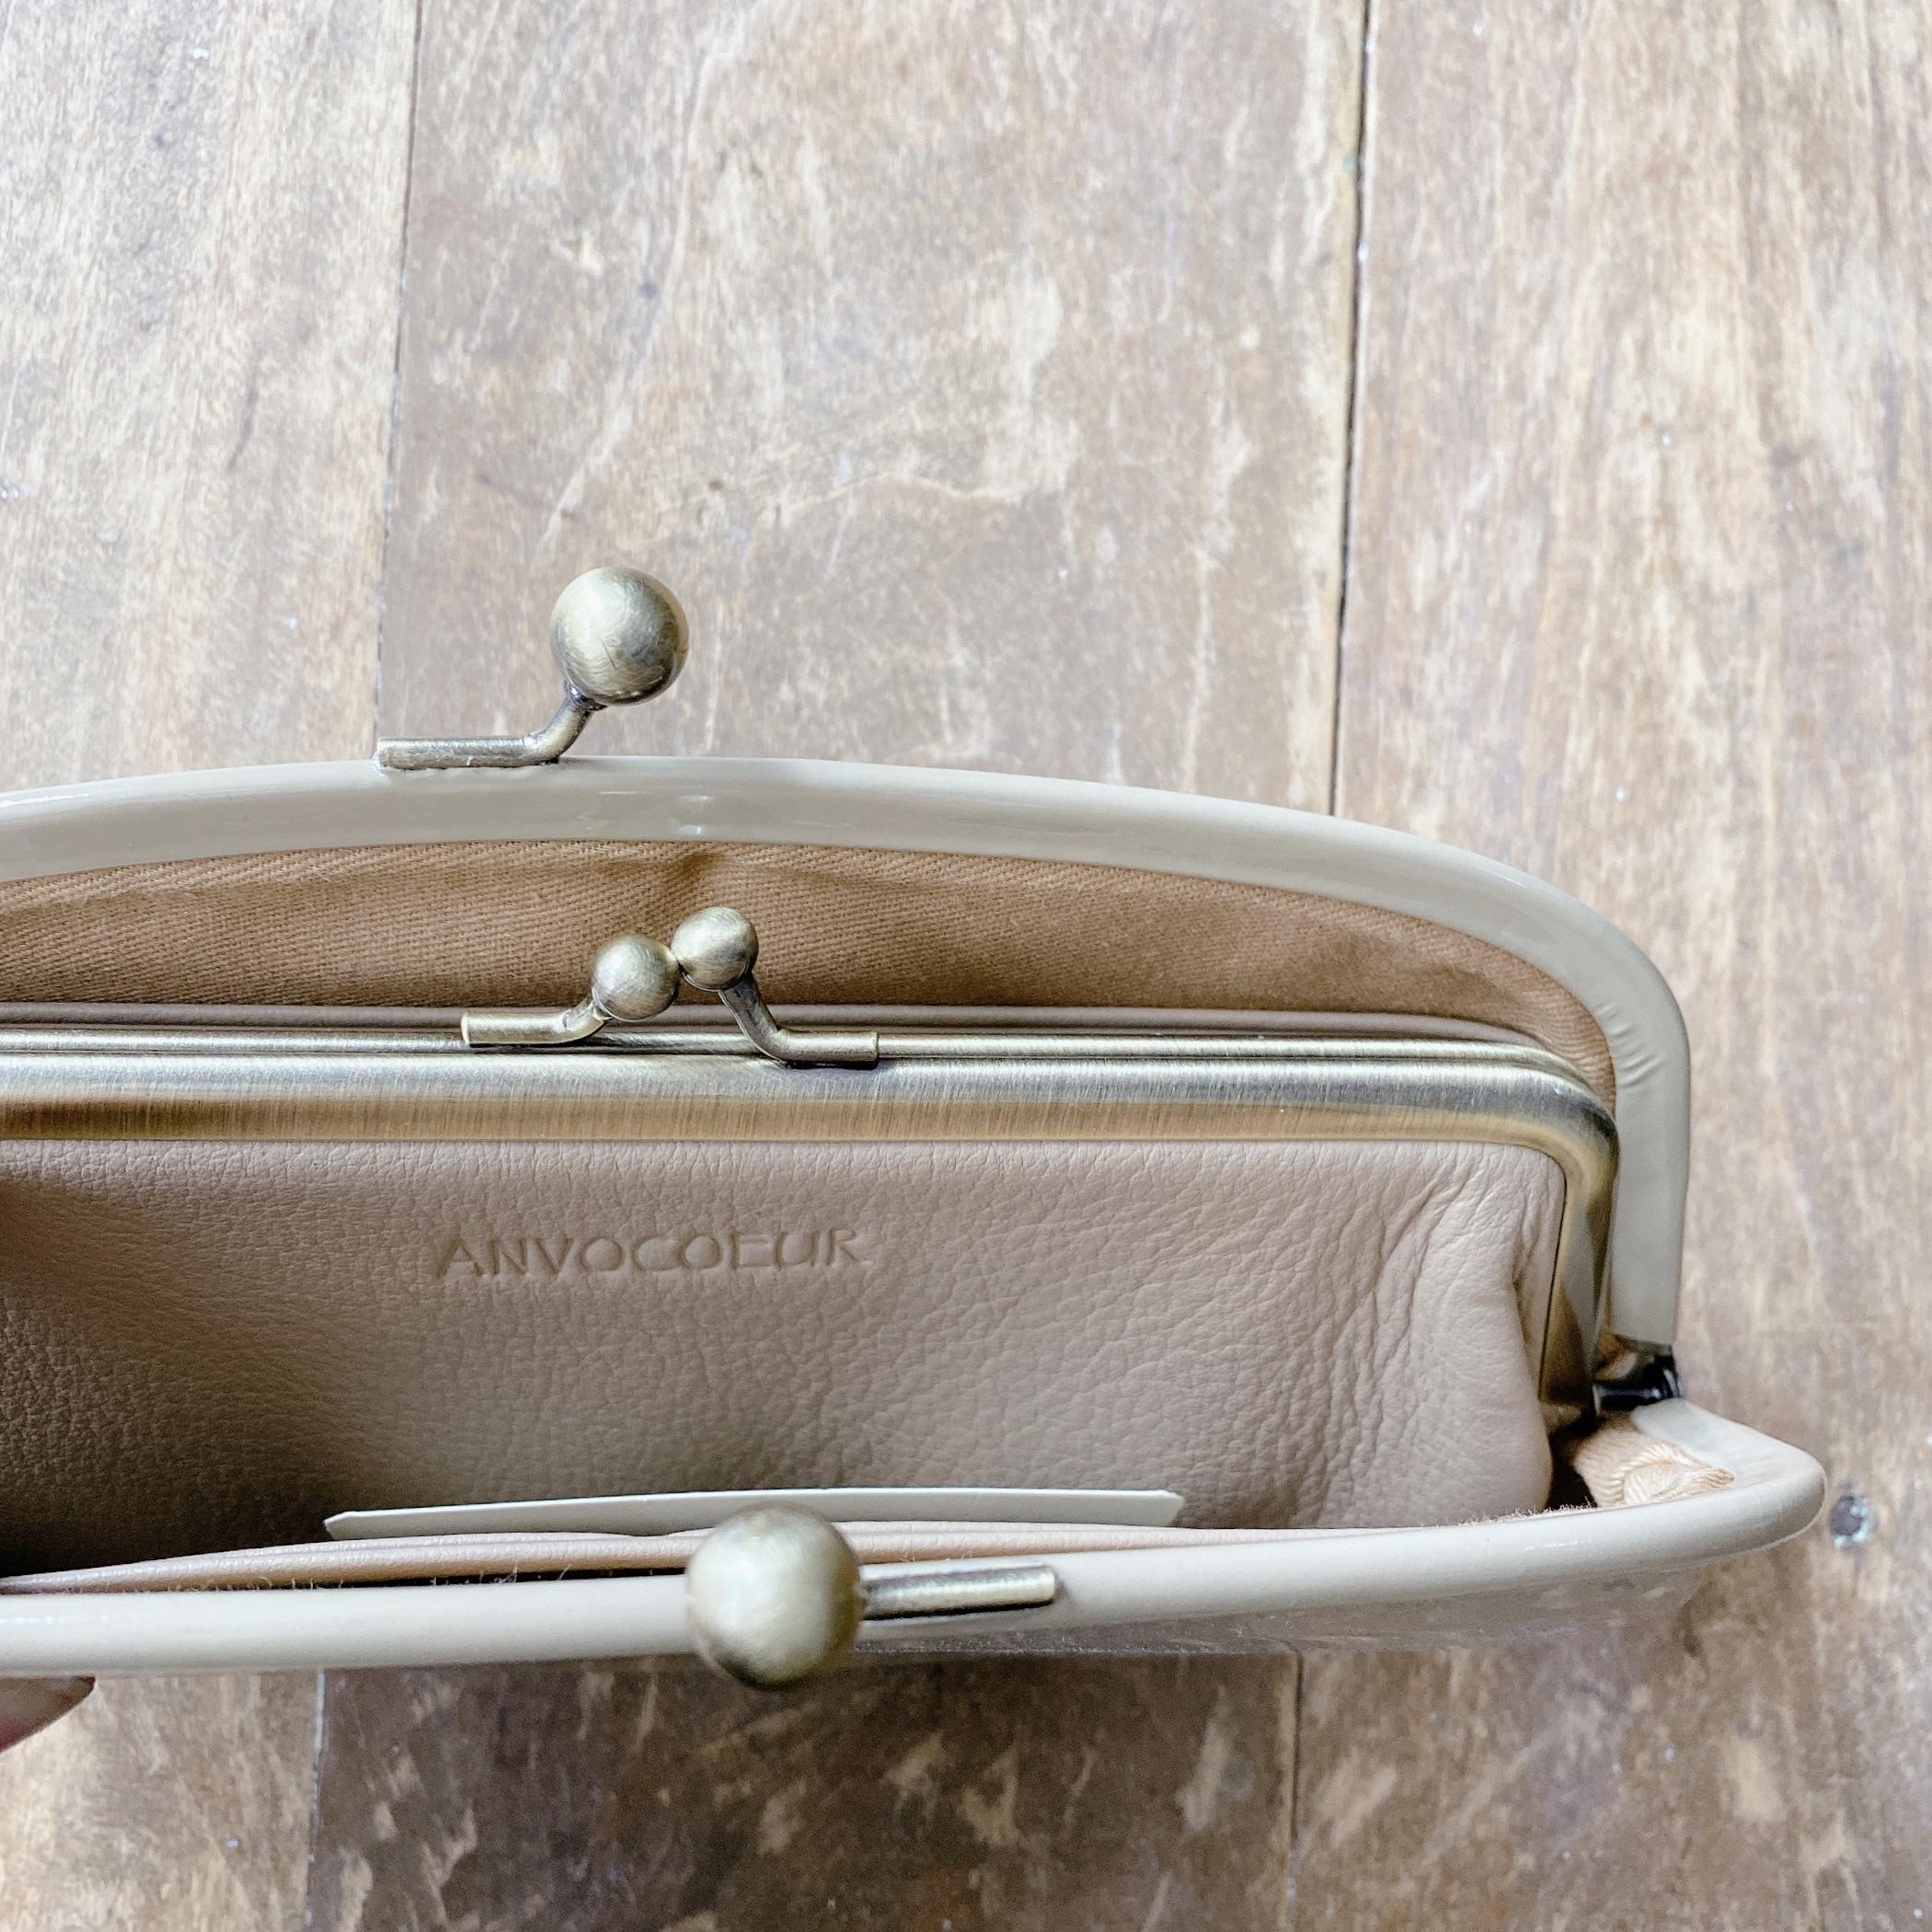 ANVOCOEUR Marietta long wallet -limited-